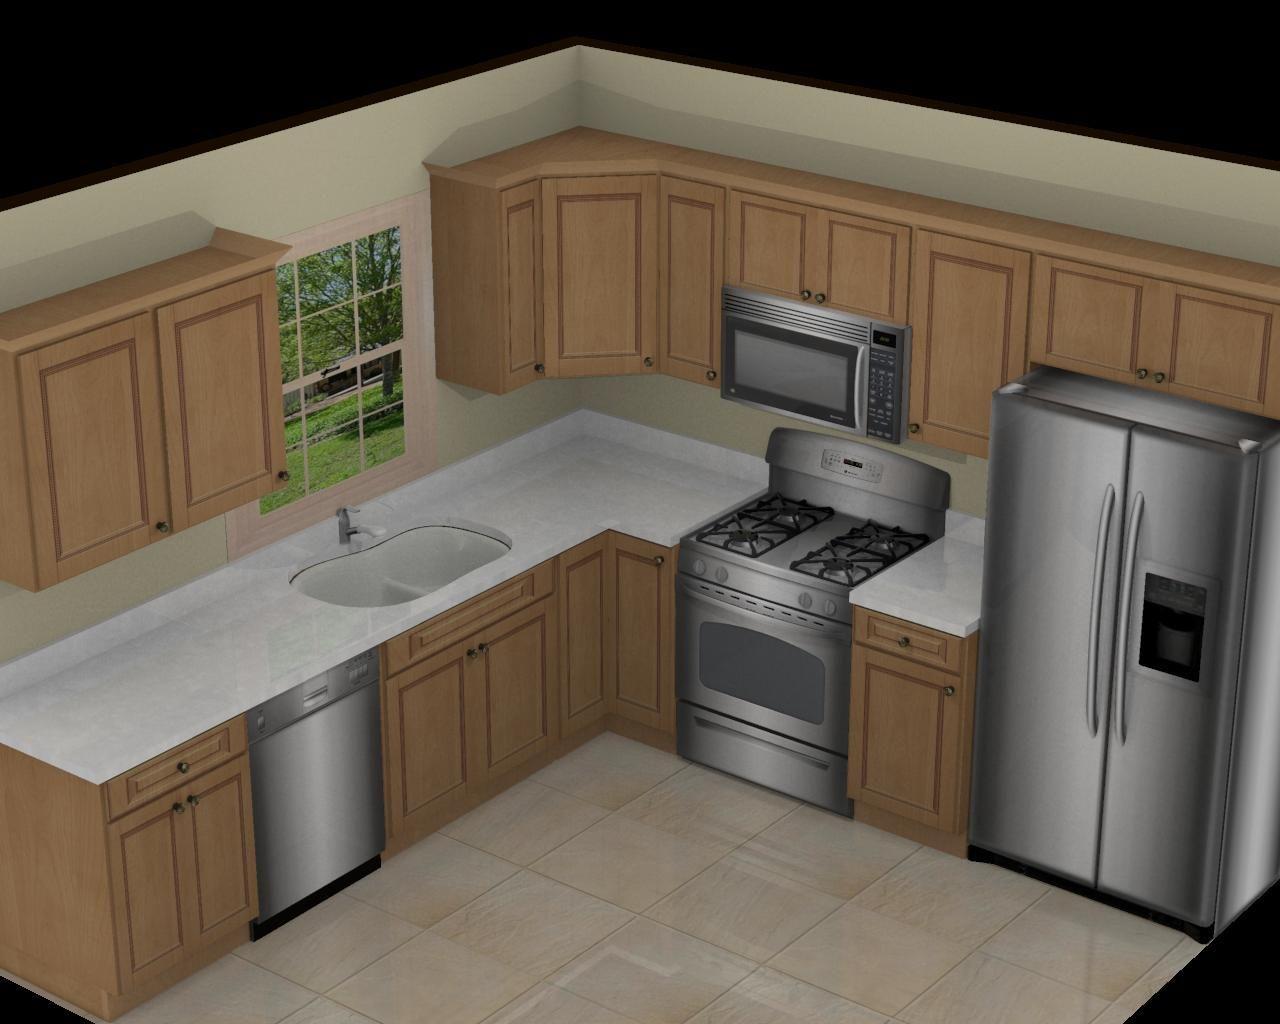 12 X 10 Kitchen Layout Ideas Small Kitchen Layouts Home Decor